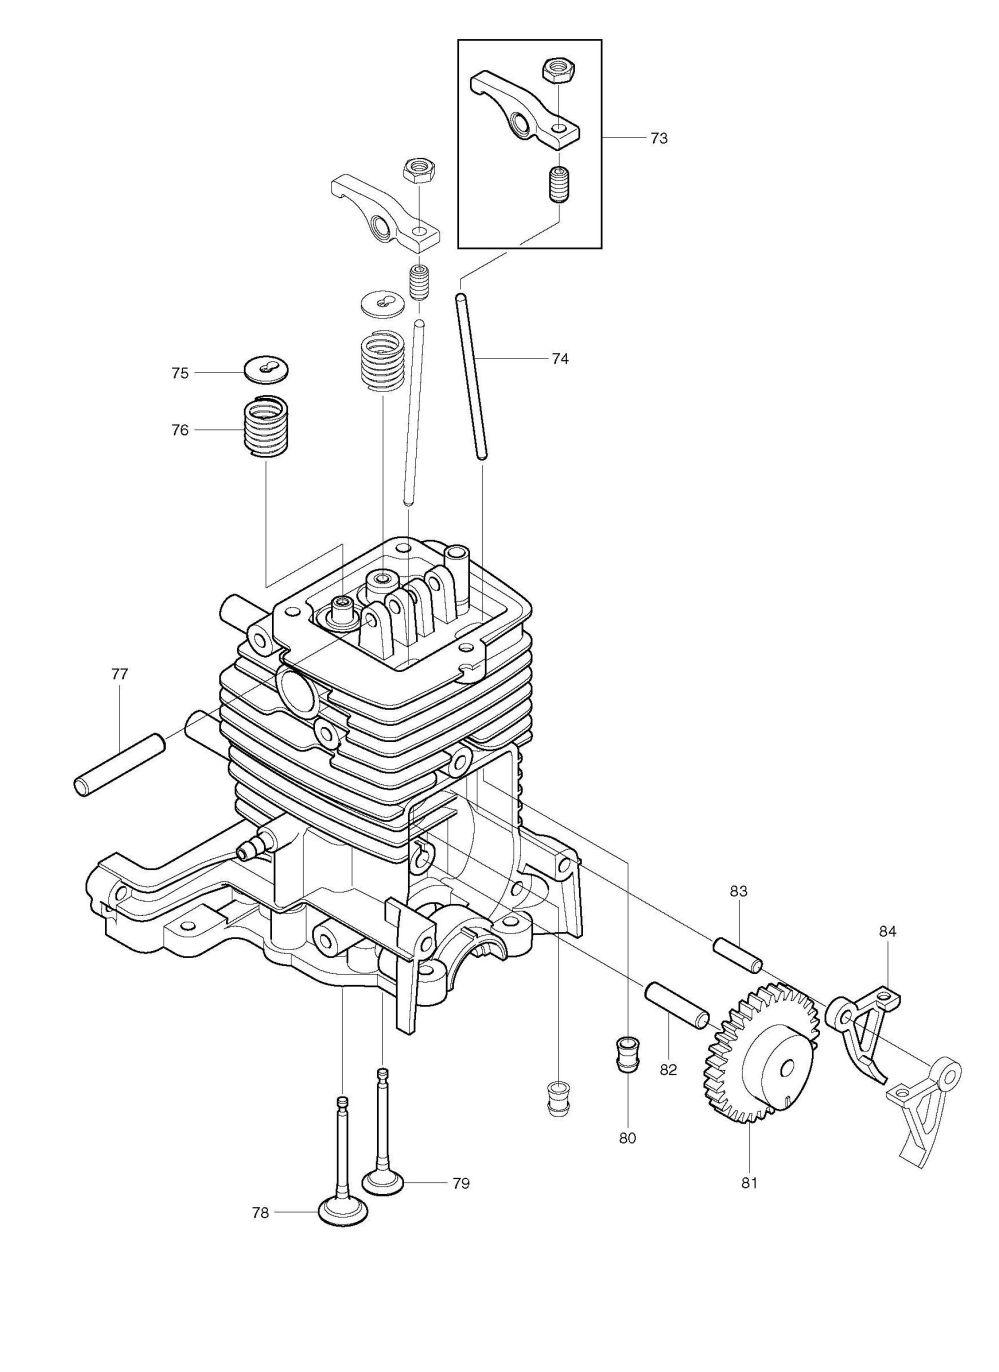 medium resolution of makita blower wiring diagram wiring diagrams schema blower air cleaner makita blower wiring diagram